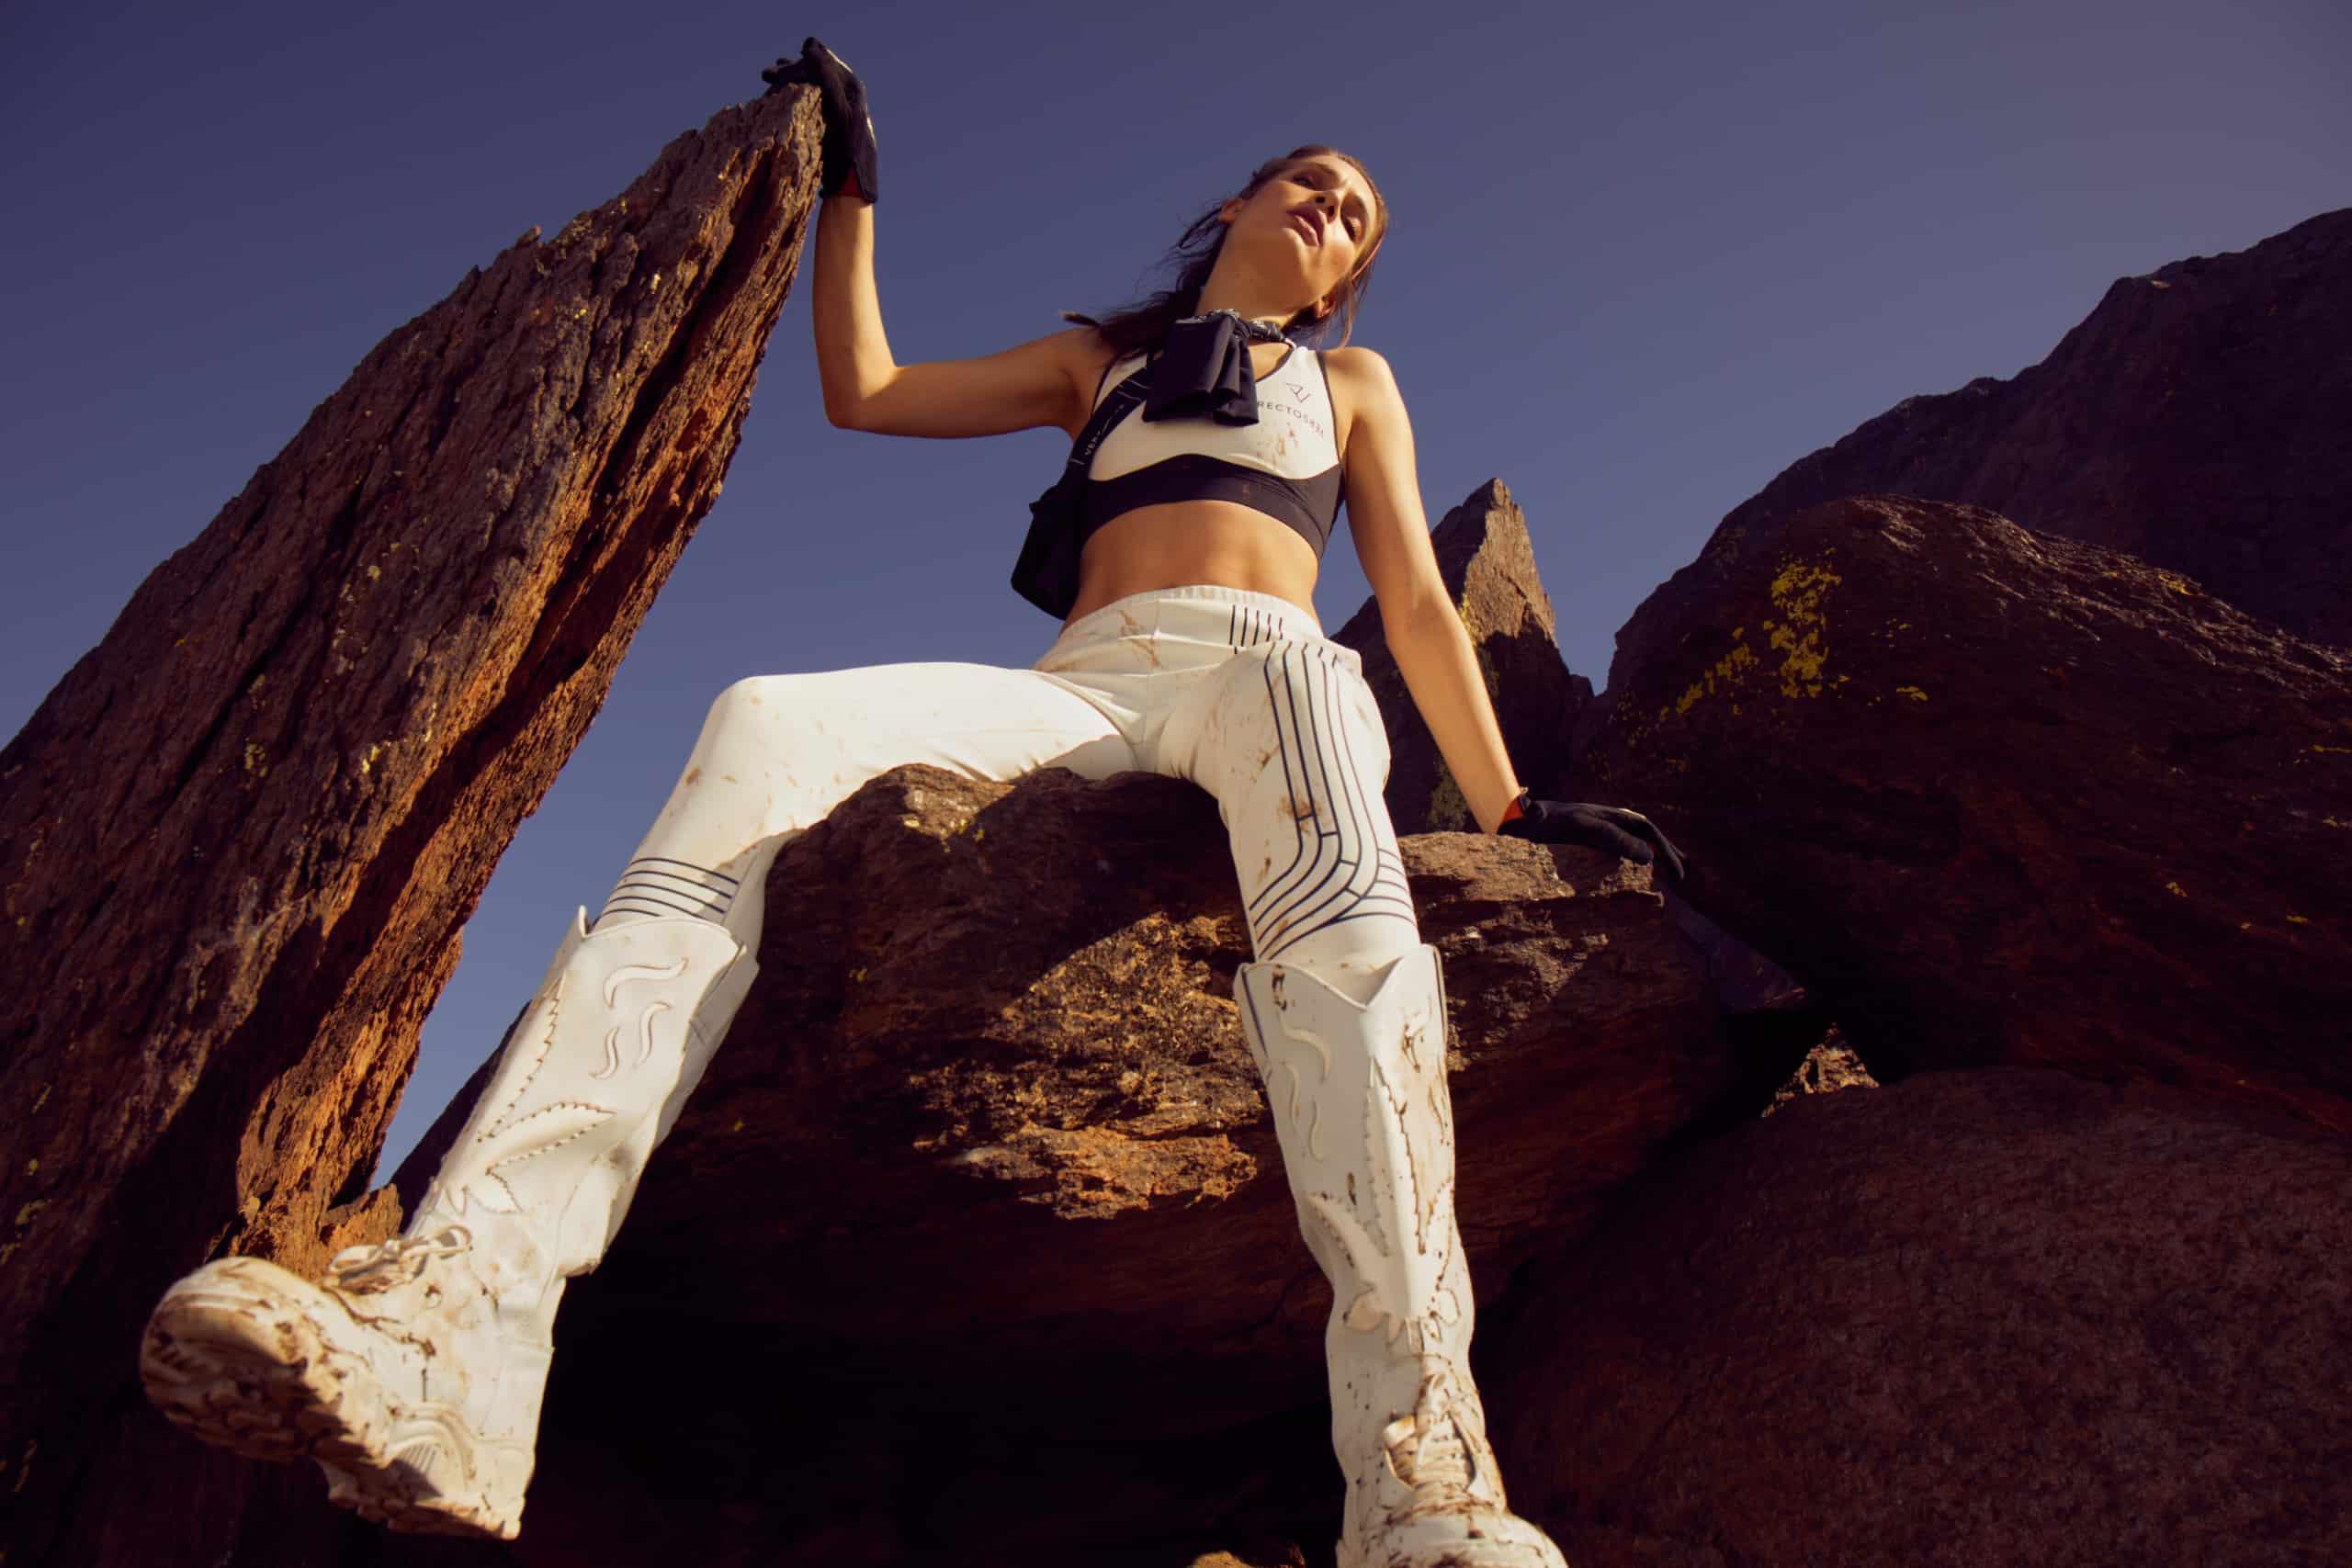 rv-c1-white-pants-air-sportsbra